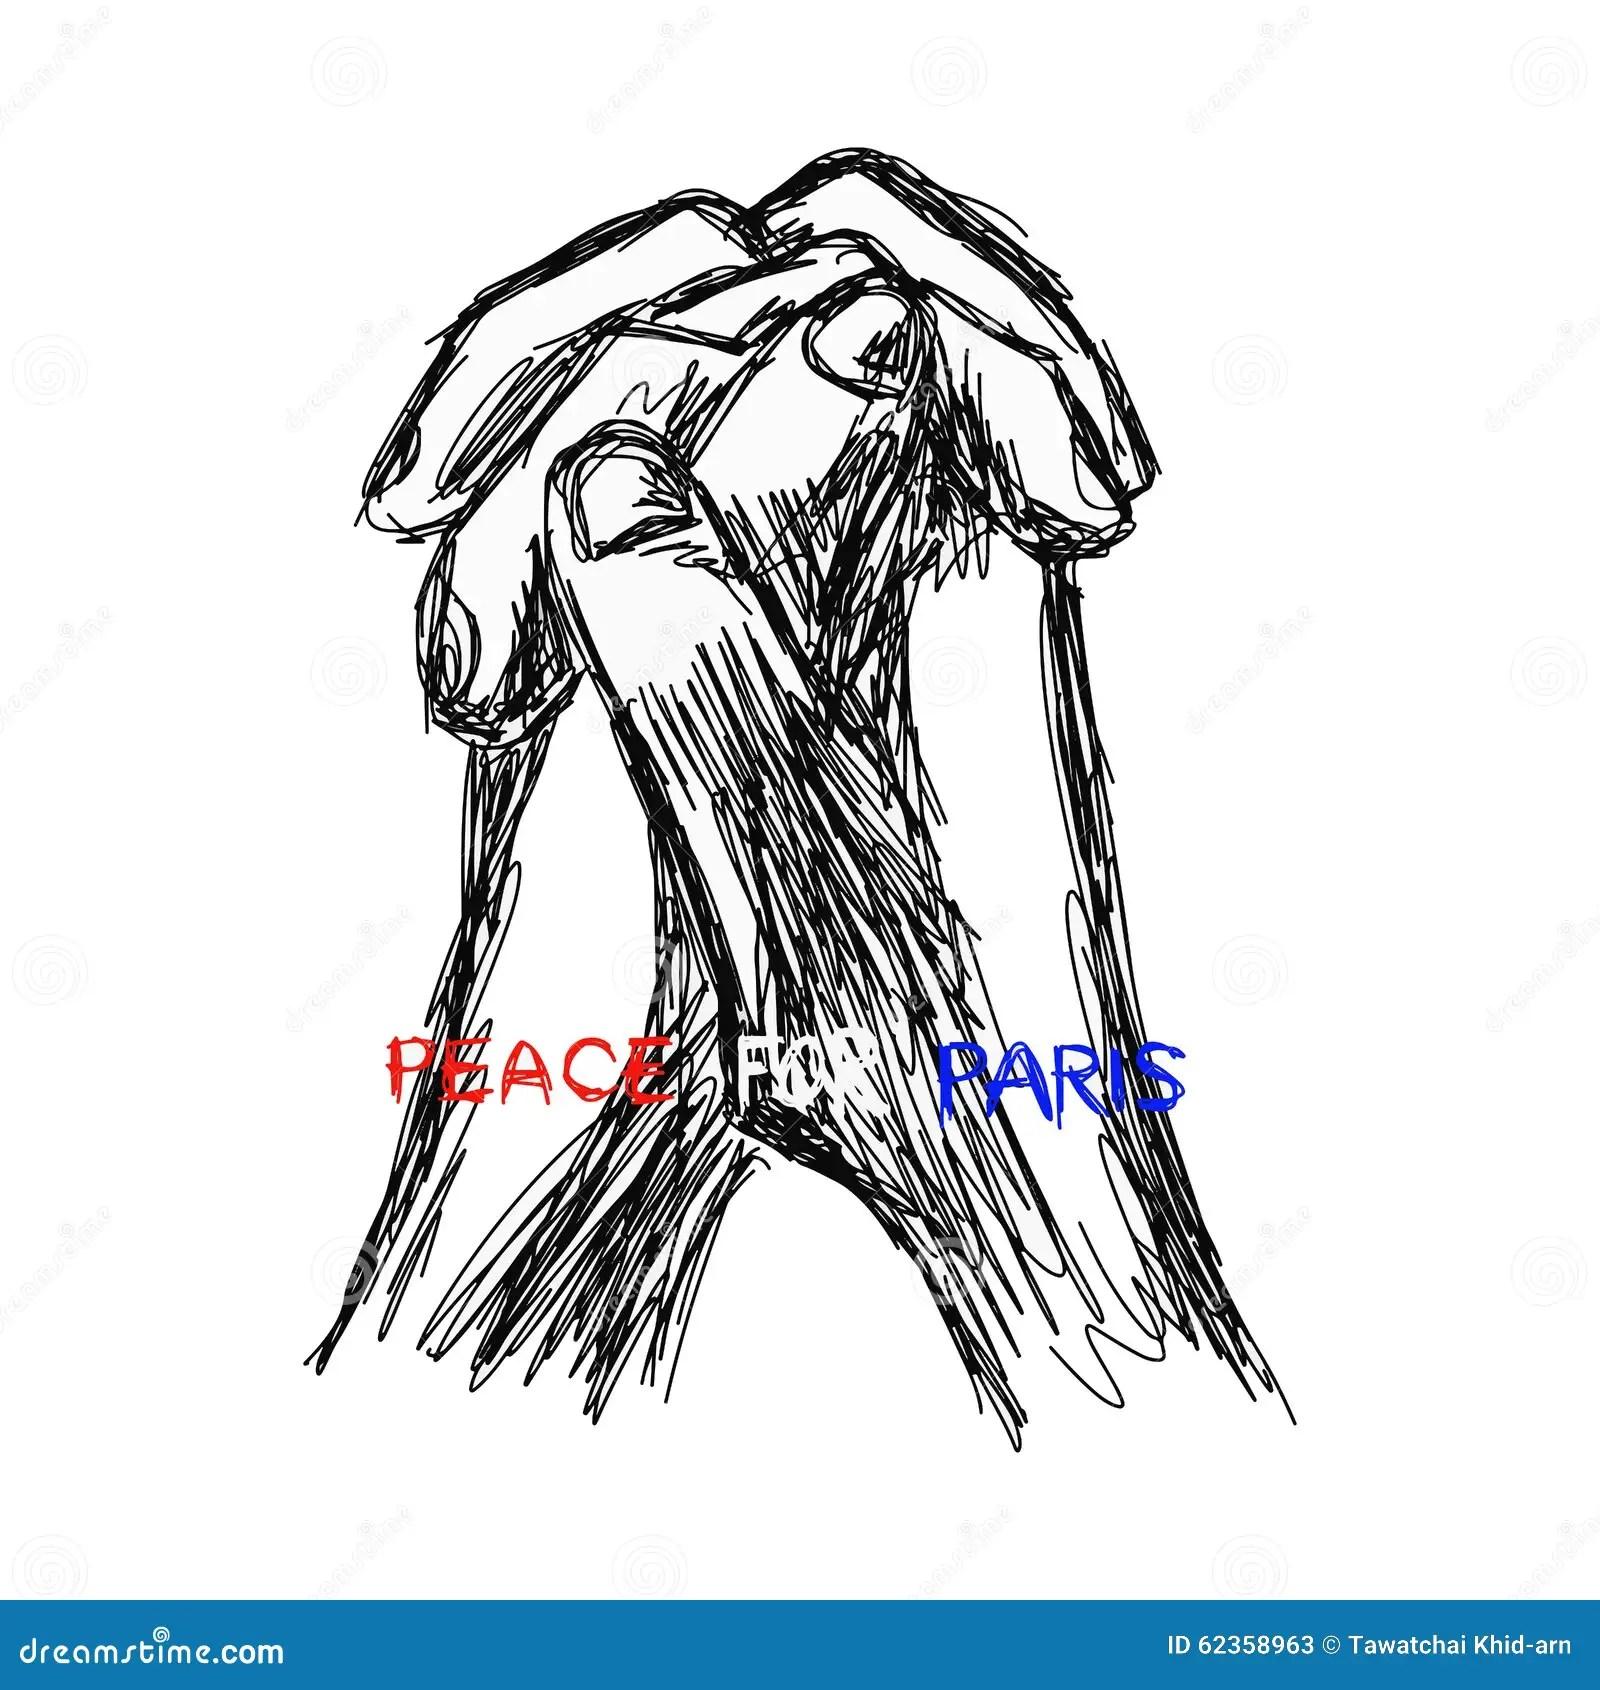 Illustration Vector Doodle Hand Drawn Of Sketch Praying